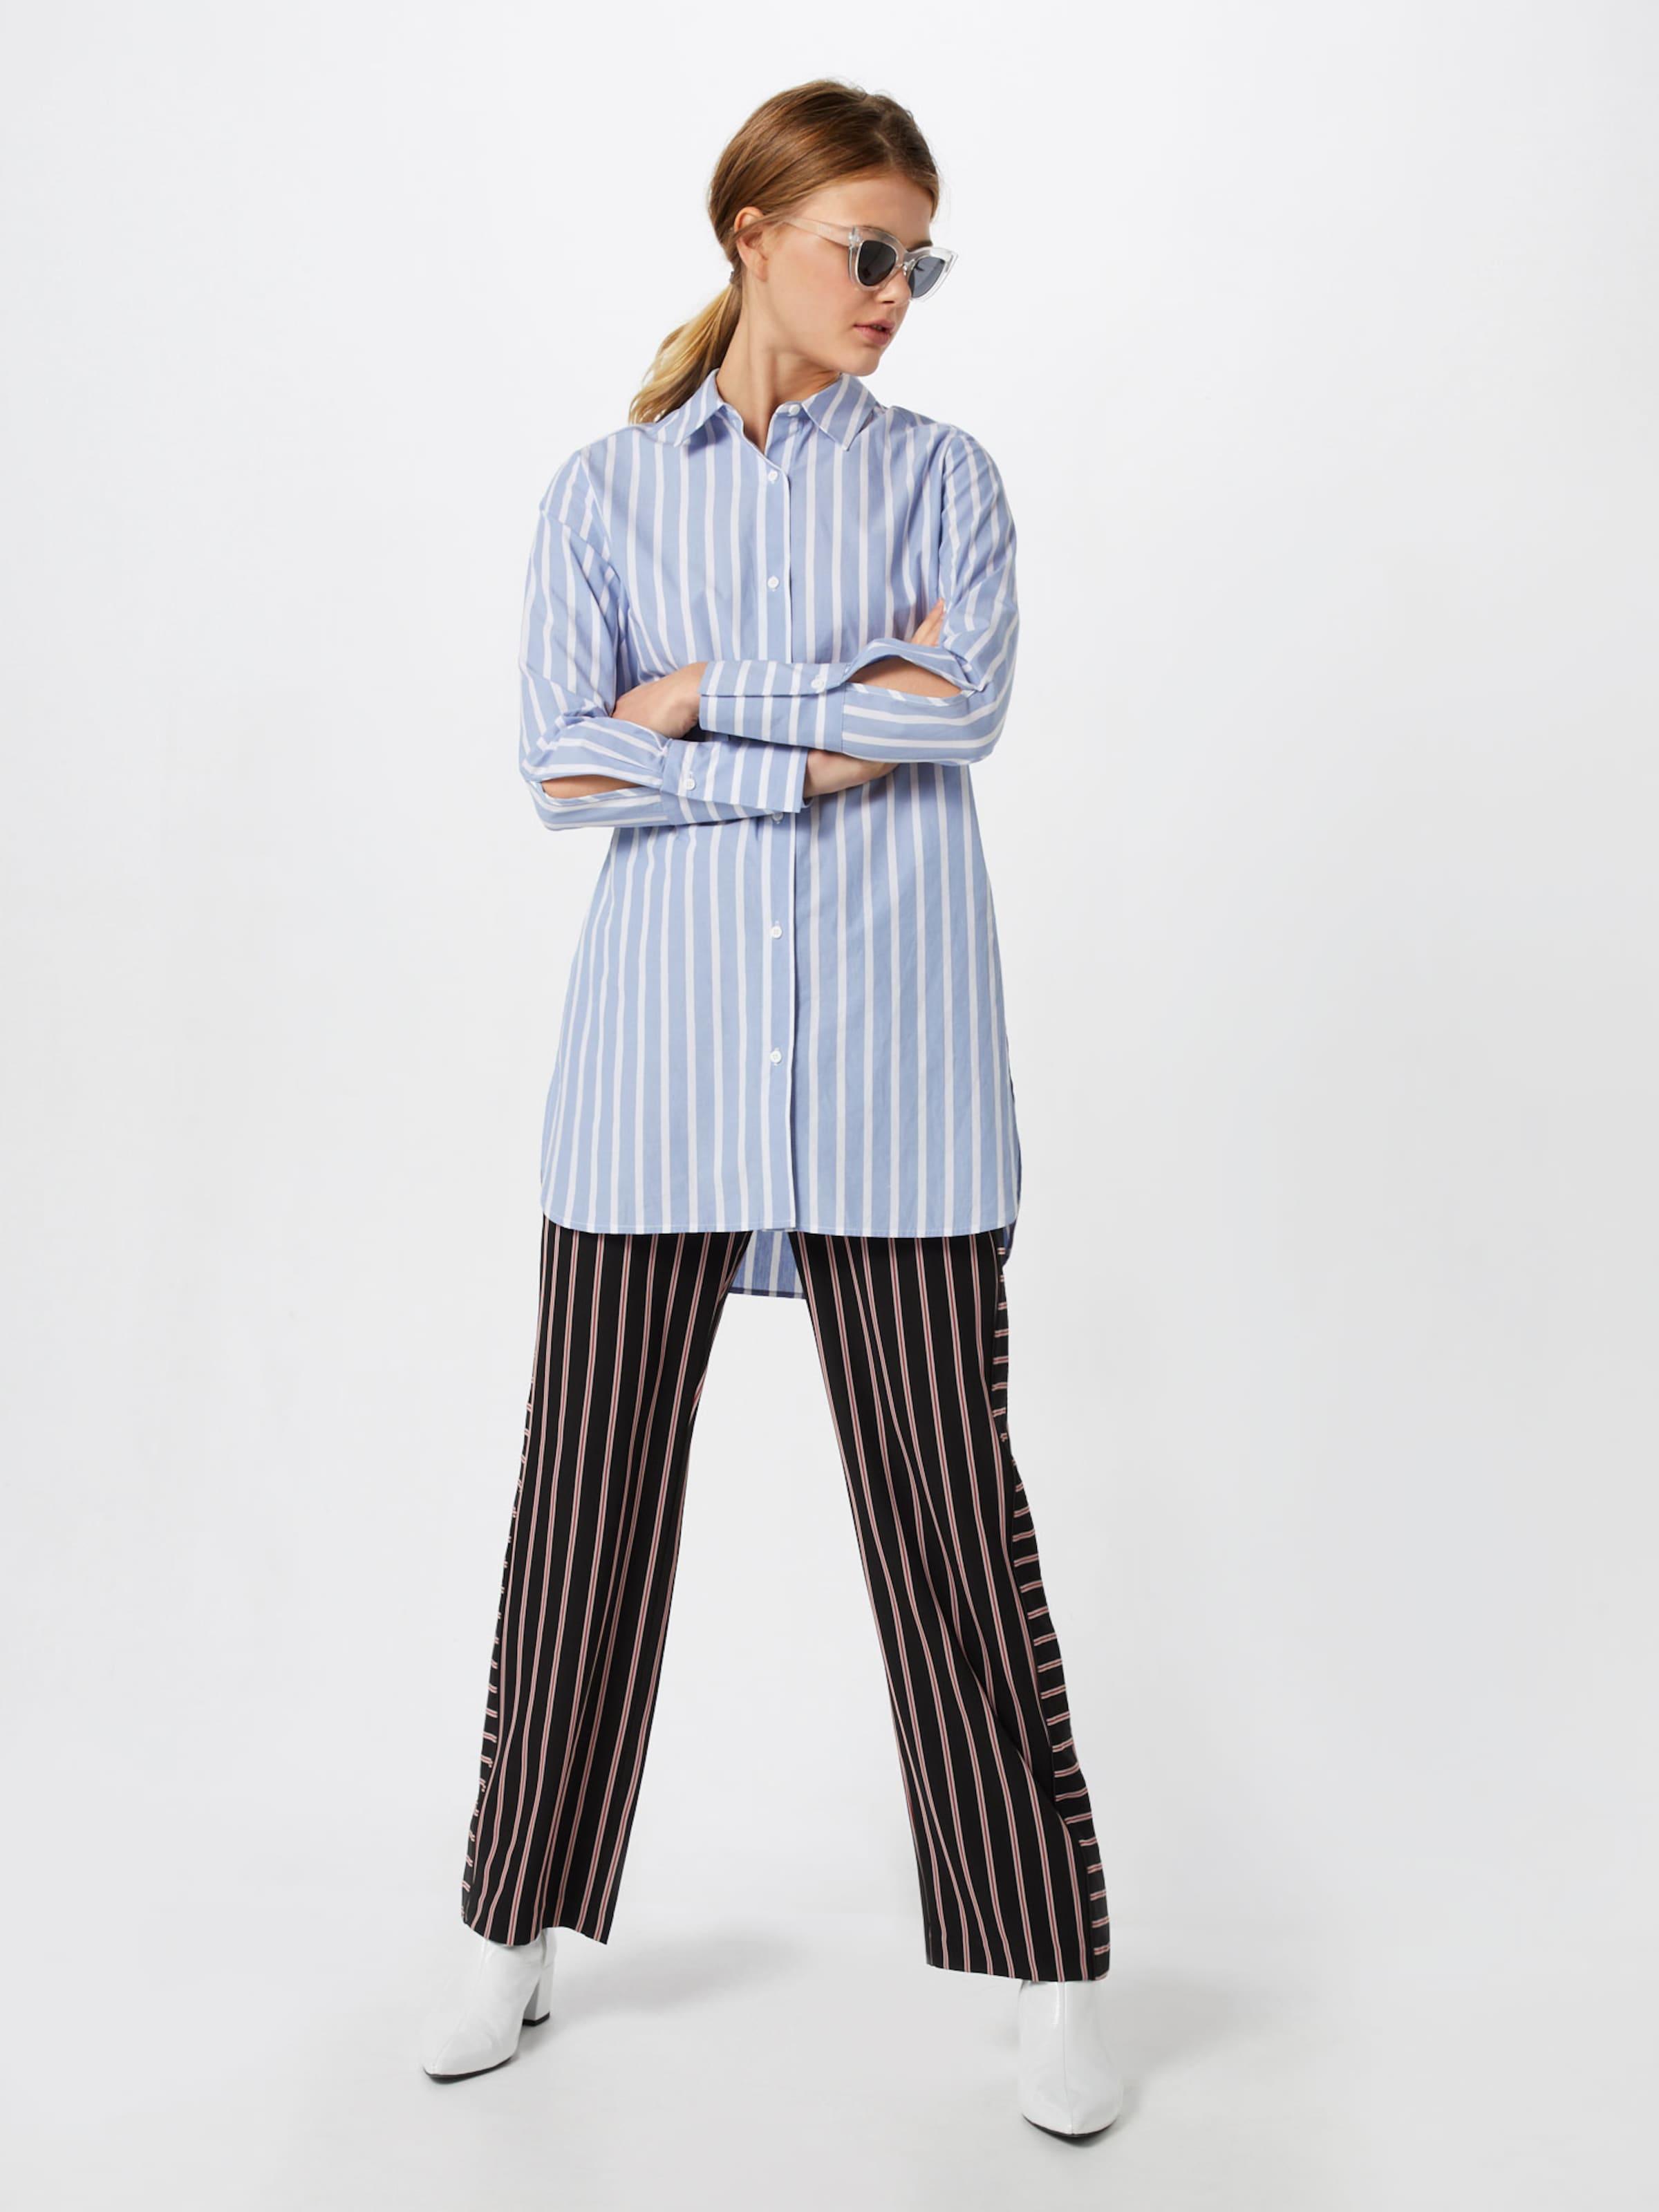 En Second 'lista Noir Female Pantalon Trousers' FTlK1Jc